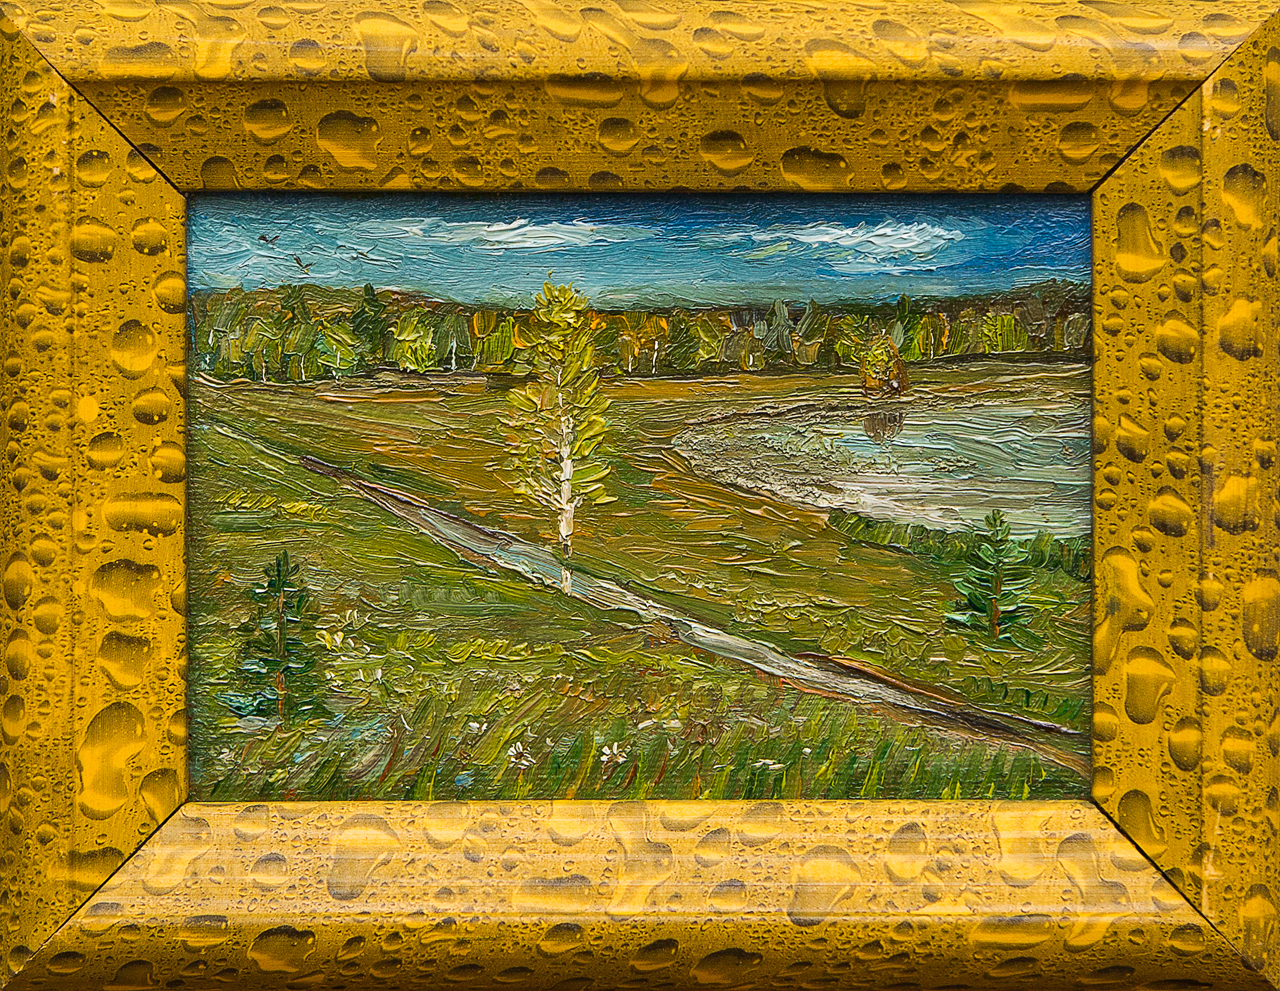 Картина маслом После дождя Мифтахов картина маслом подсолнухи мифтахов